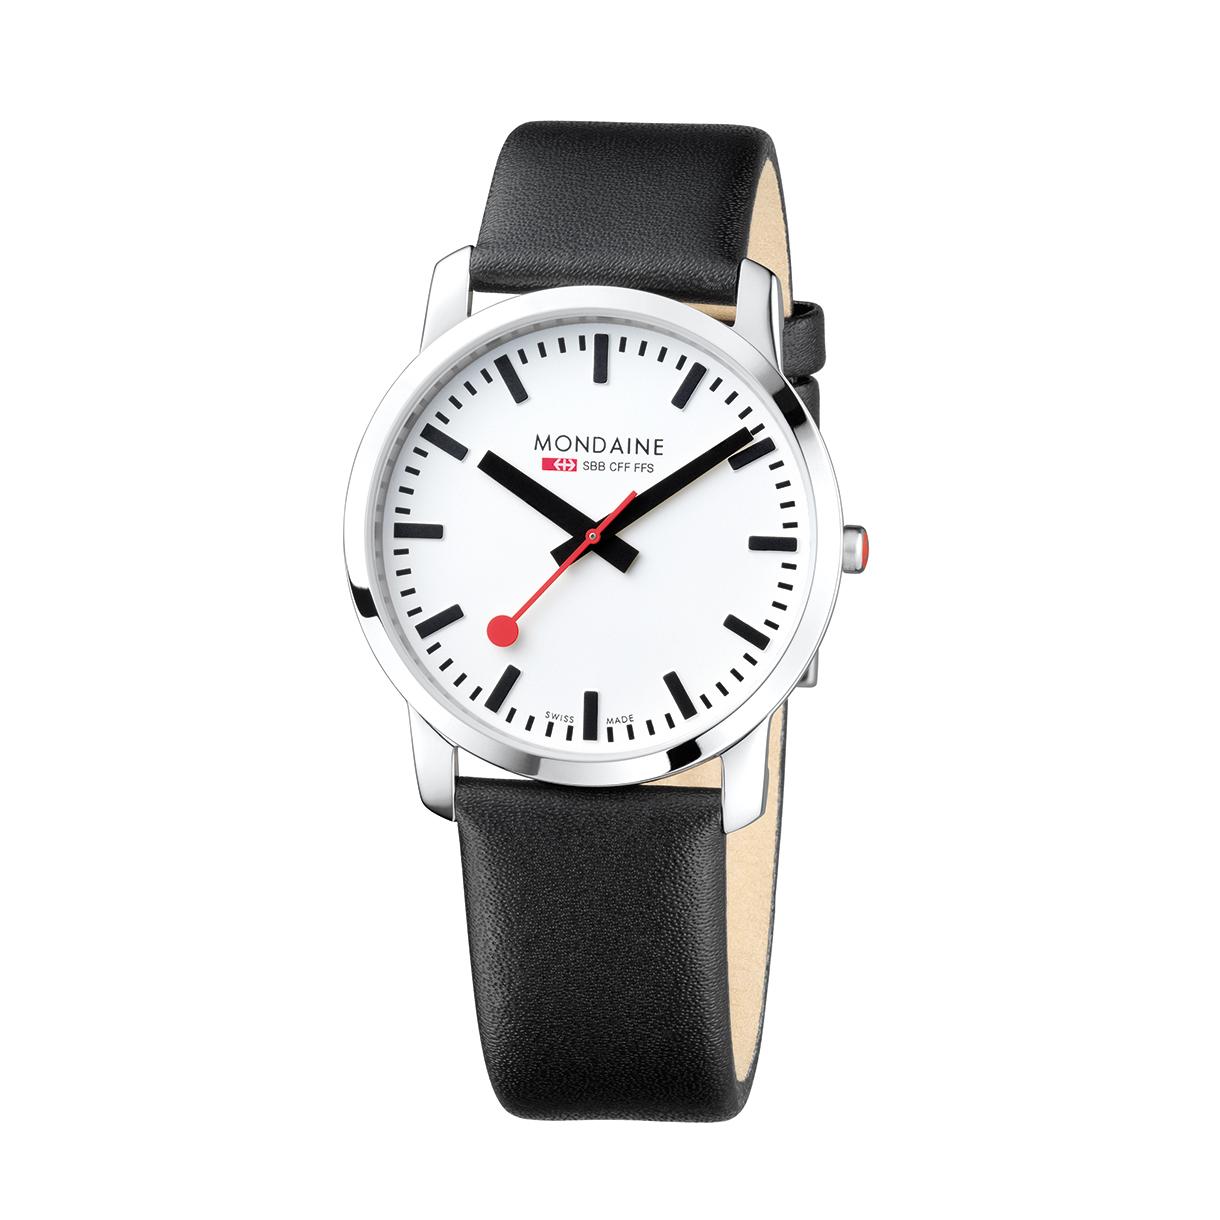 Mondaine simply elegant mondaine watches clocks - Mondaine travel clock ...